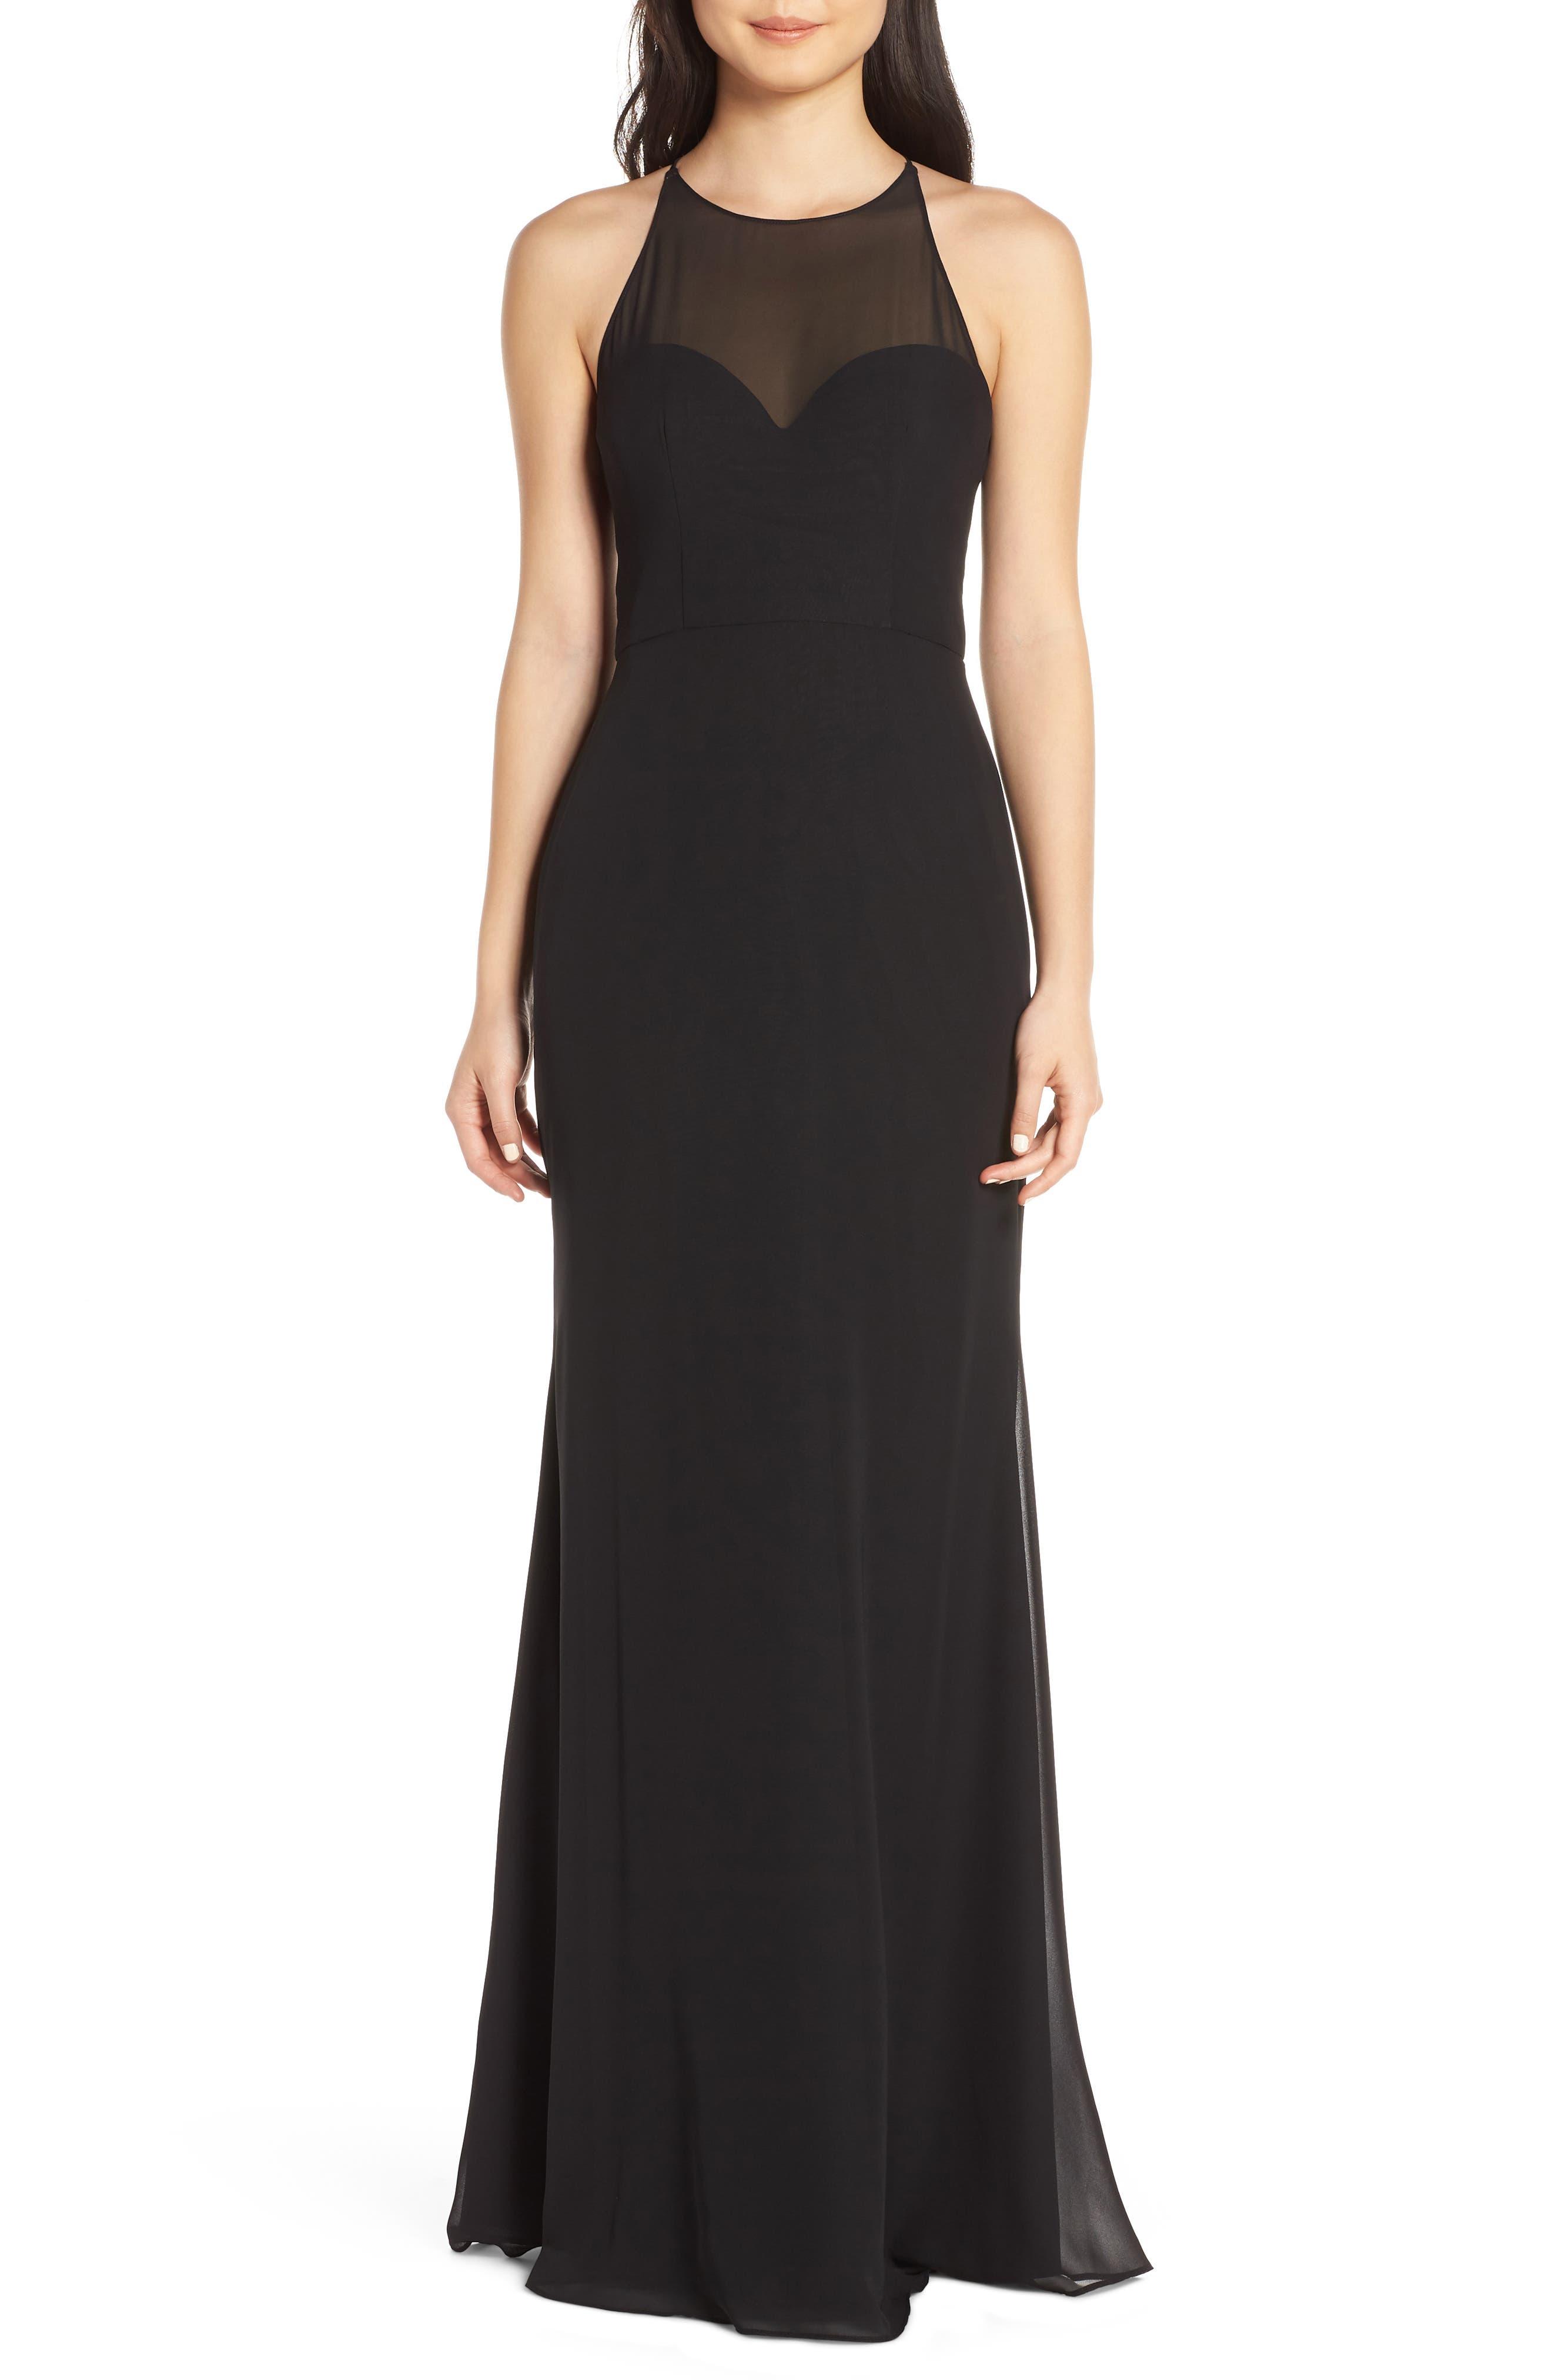 Hayley Paige Occasions Sheer Racerback Chiffon Evening Dress, Black